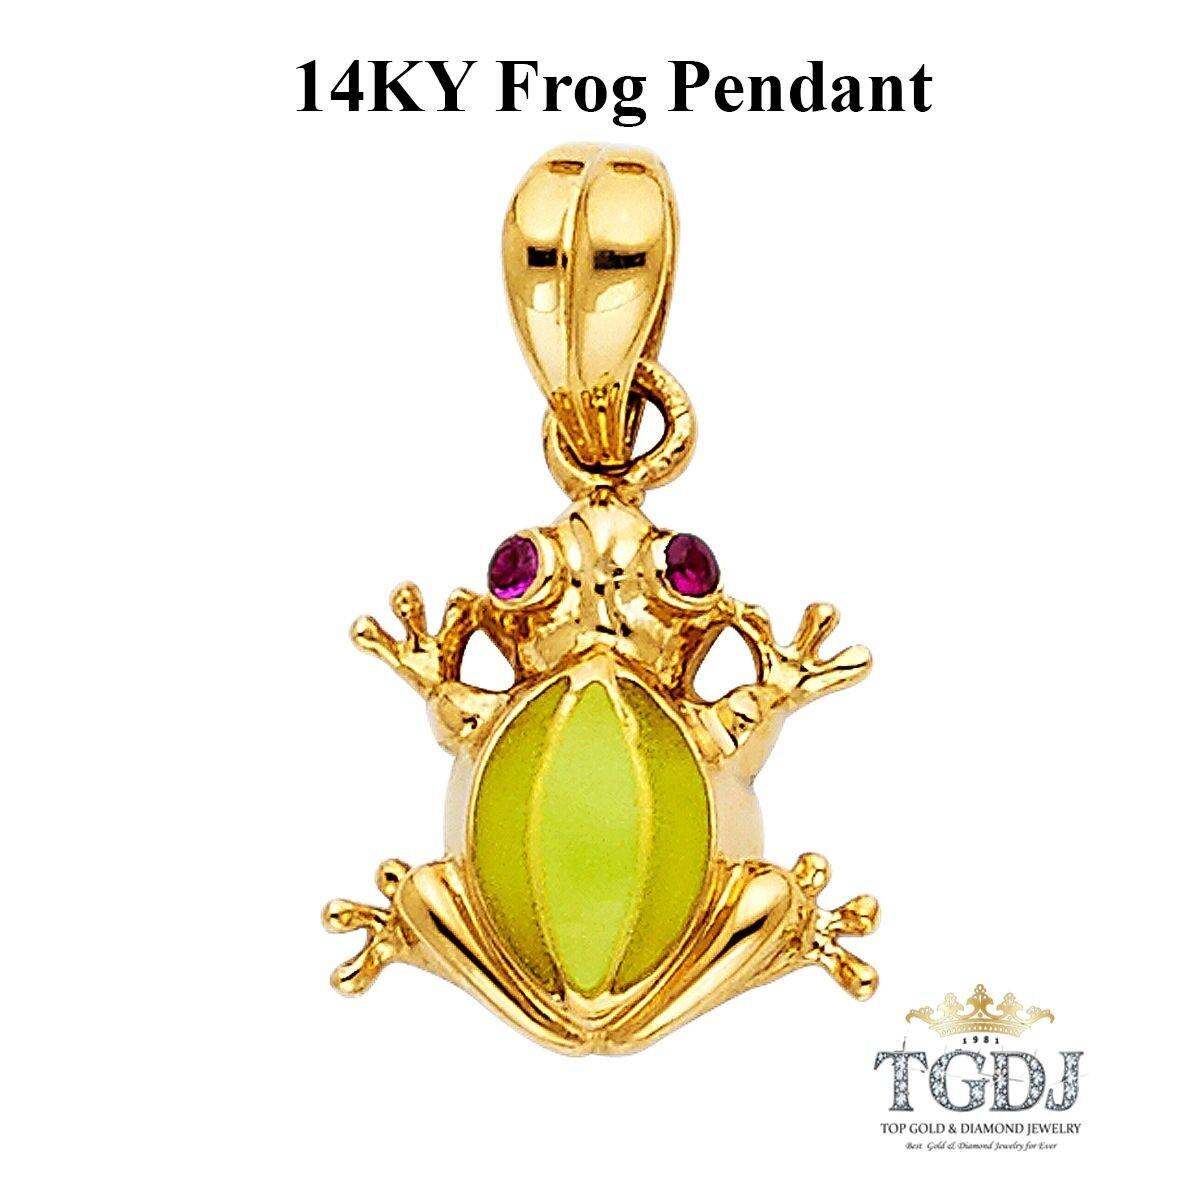 Frog Pendant, 14K Yellow gold  Frog Pendant